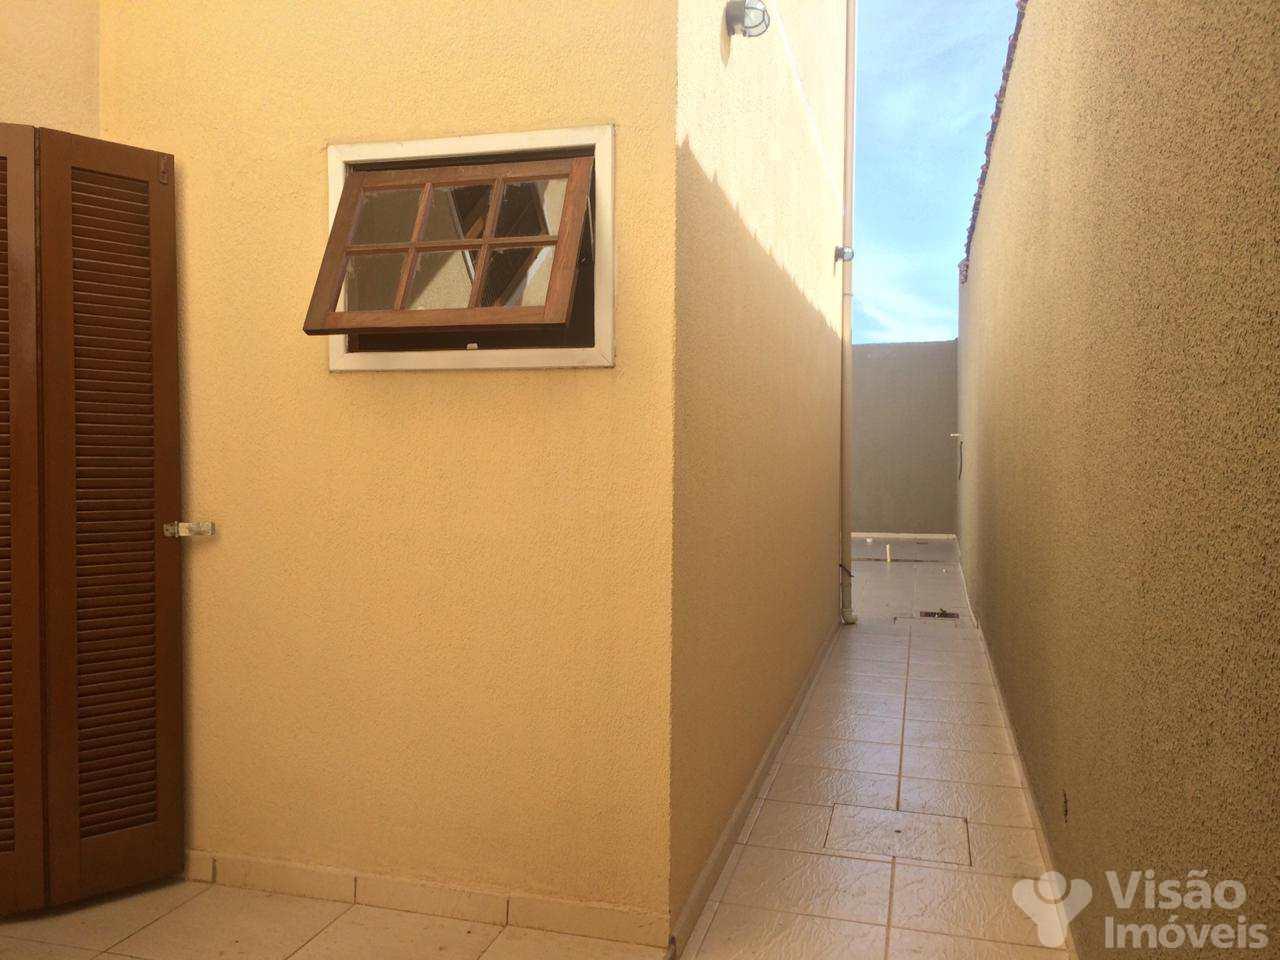 Sobrado com 3 dorms, Maria Áurea, Pindamonhangaba - R$ 390 mil, Cod: 1920012